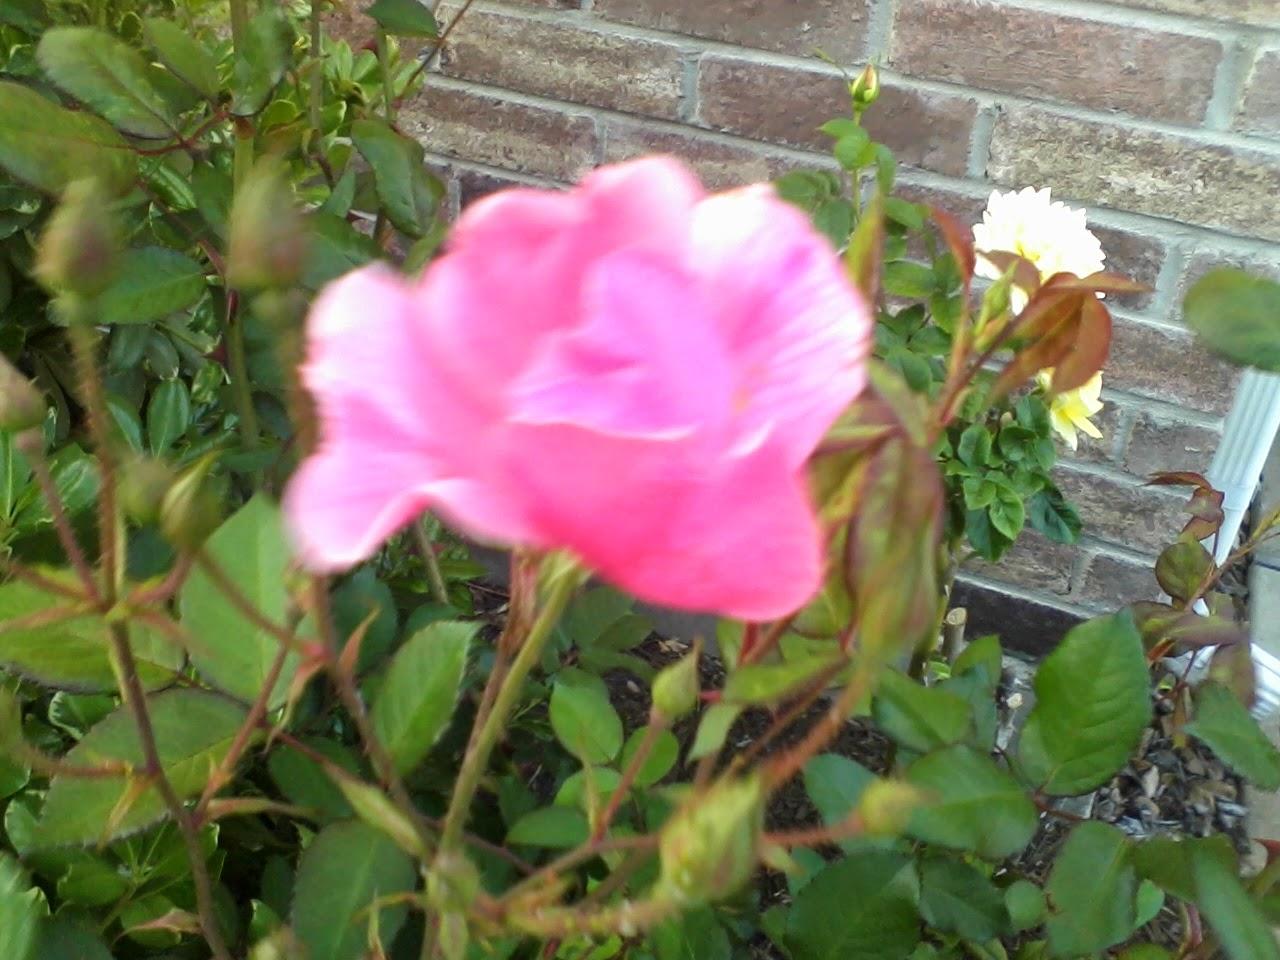 Gardening 2014 - 0411192034.jpg